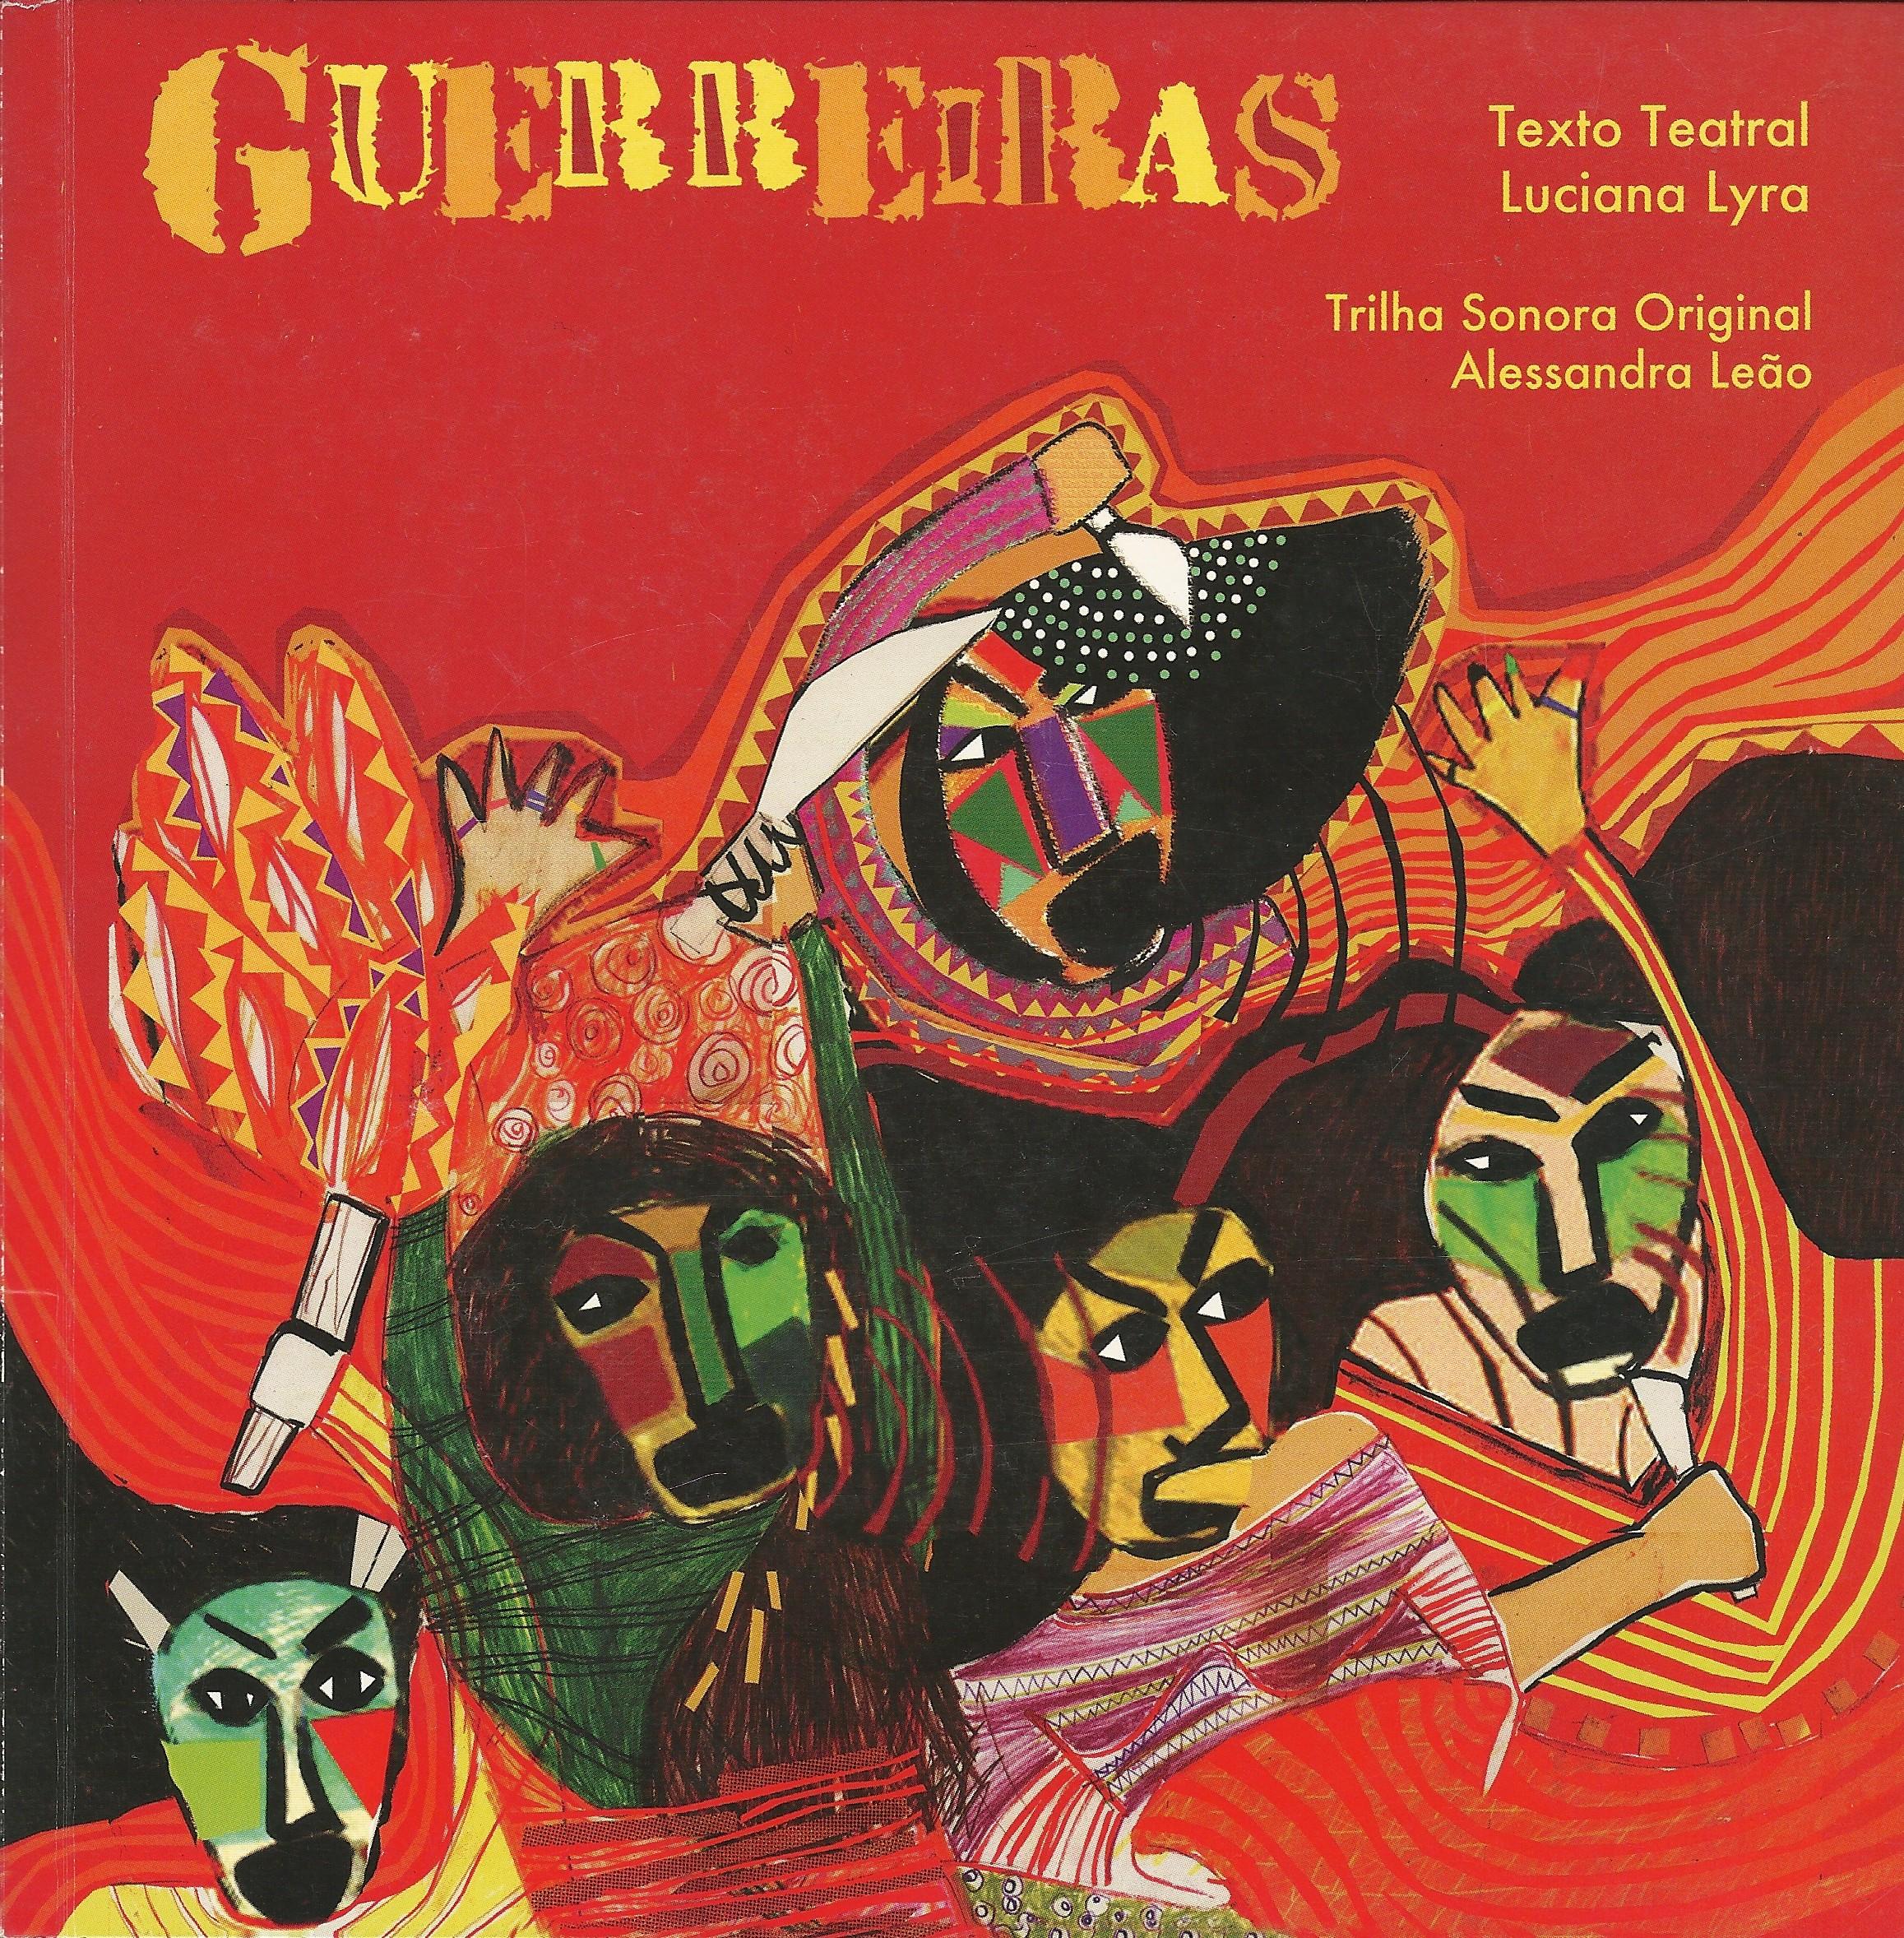 17 2010 Guerreiras (Triha Sonora Original) - Alessandra Leao.jpg